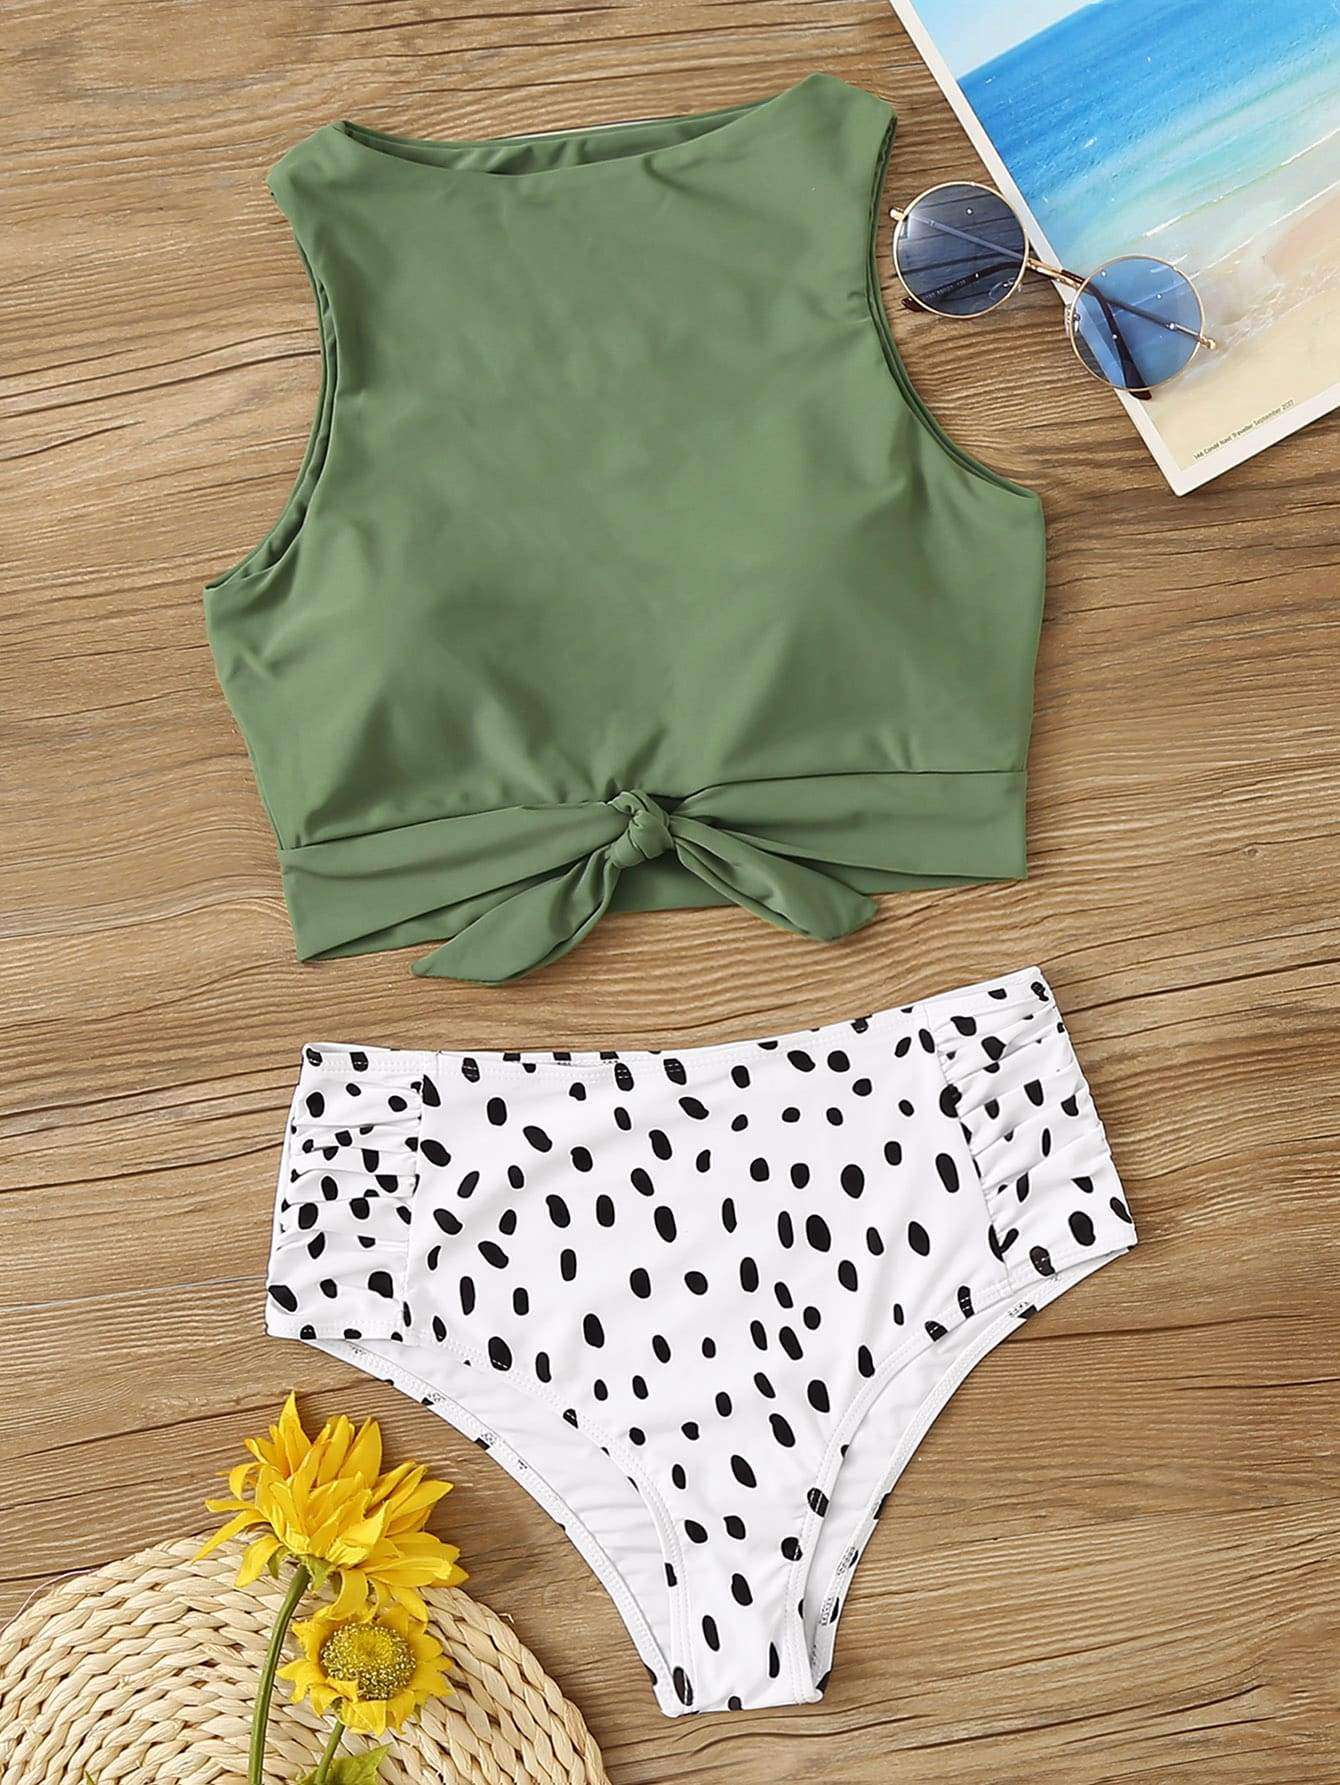 c8cd37b32d Knot Hem Top With Ruched Panty 2 Piece Swimsuit - Popviva #swimwear  #sportswear #